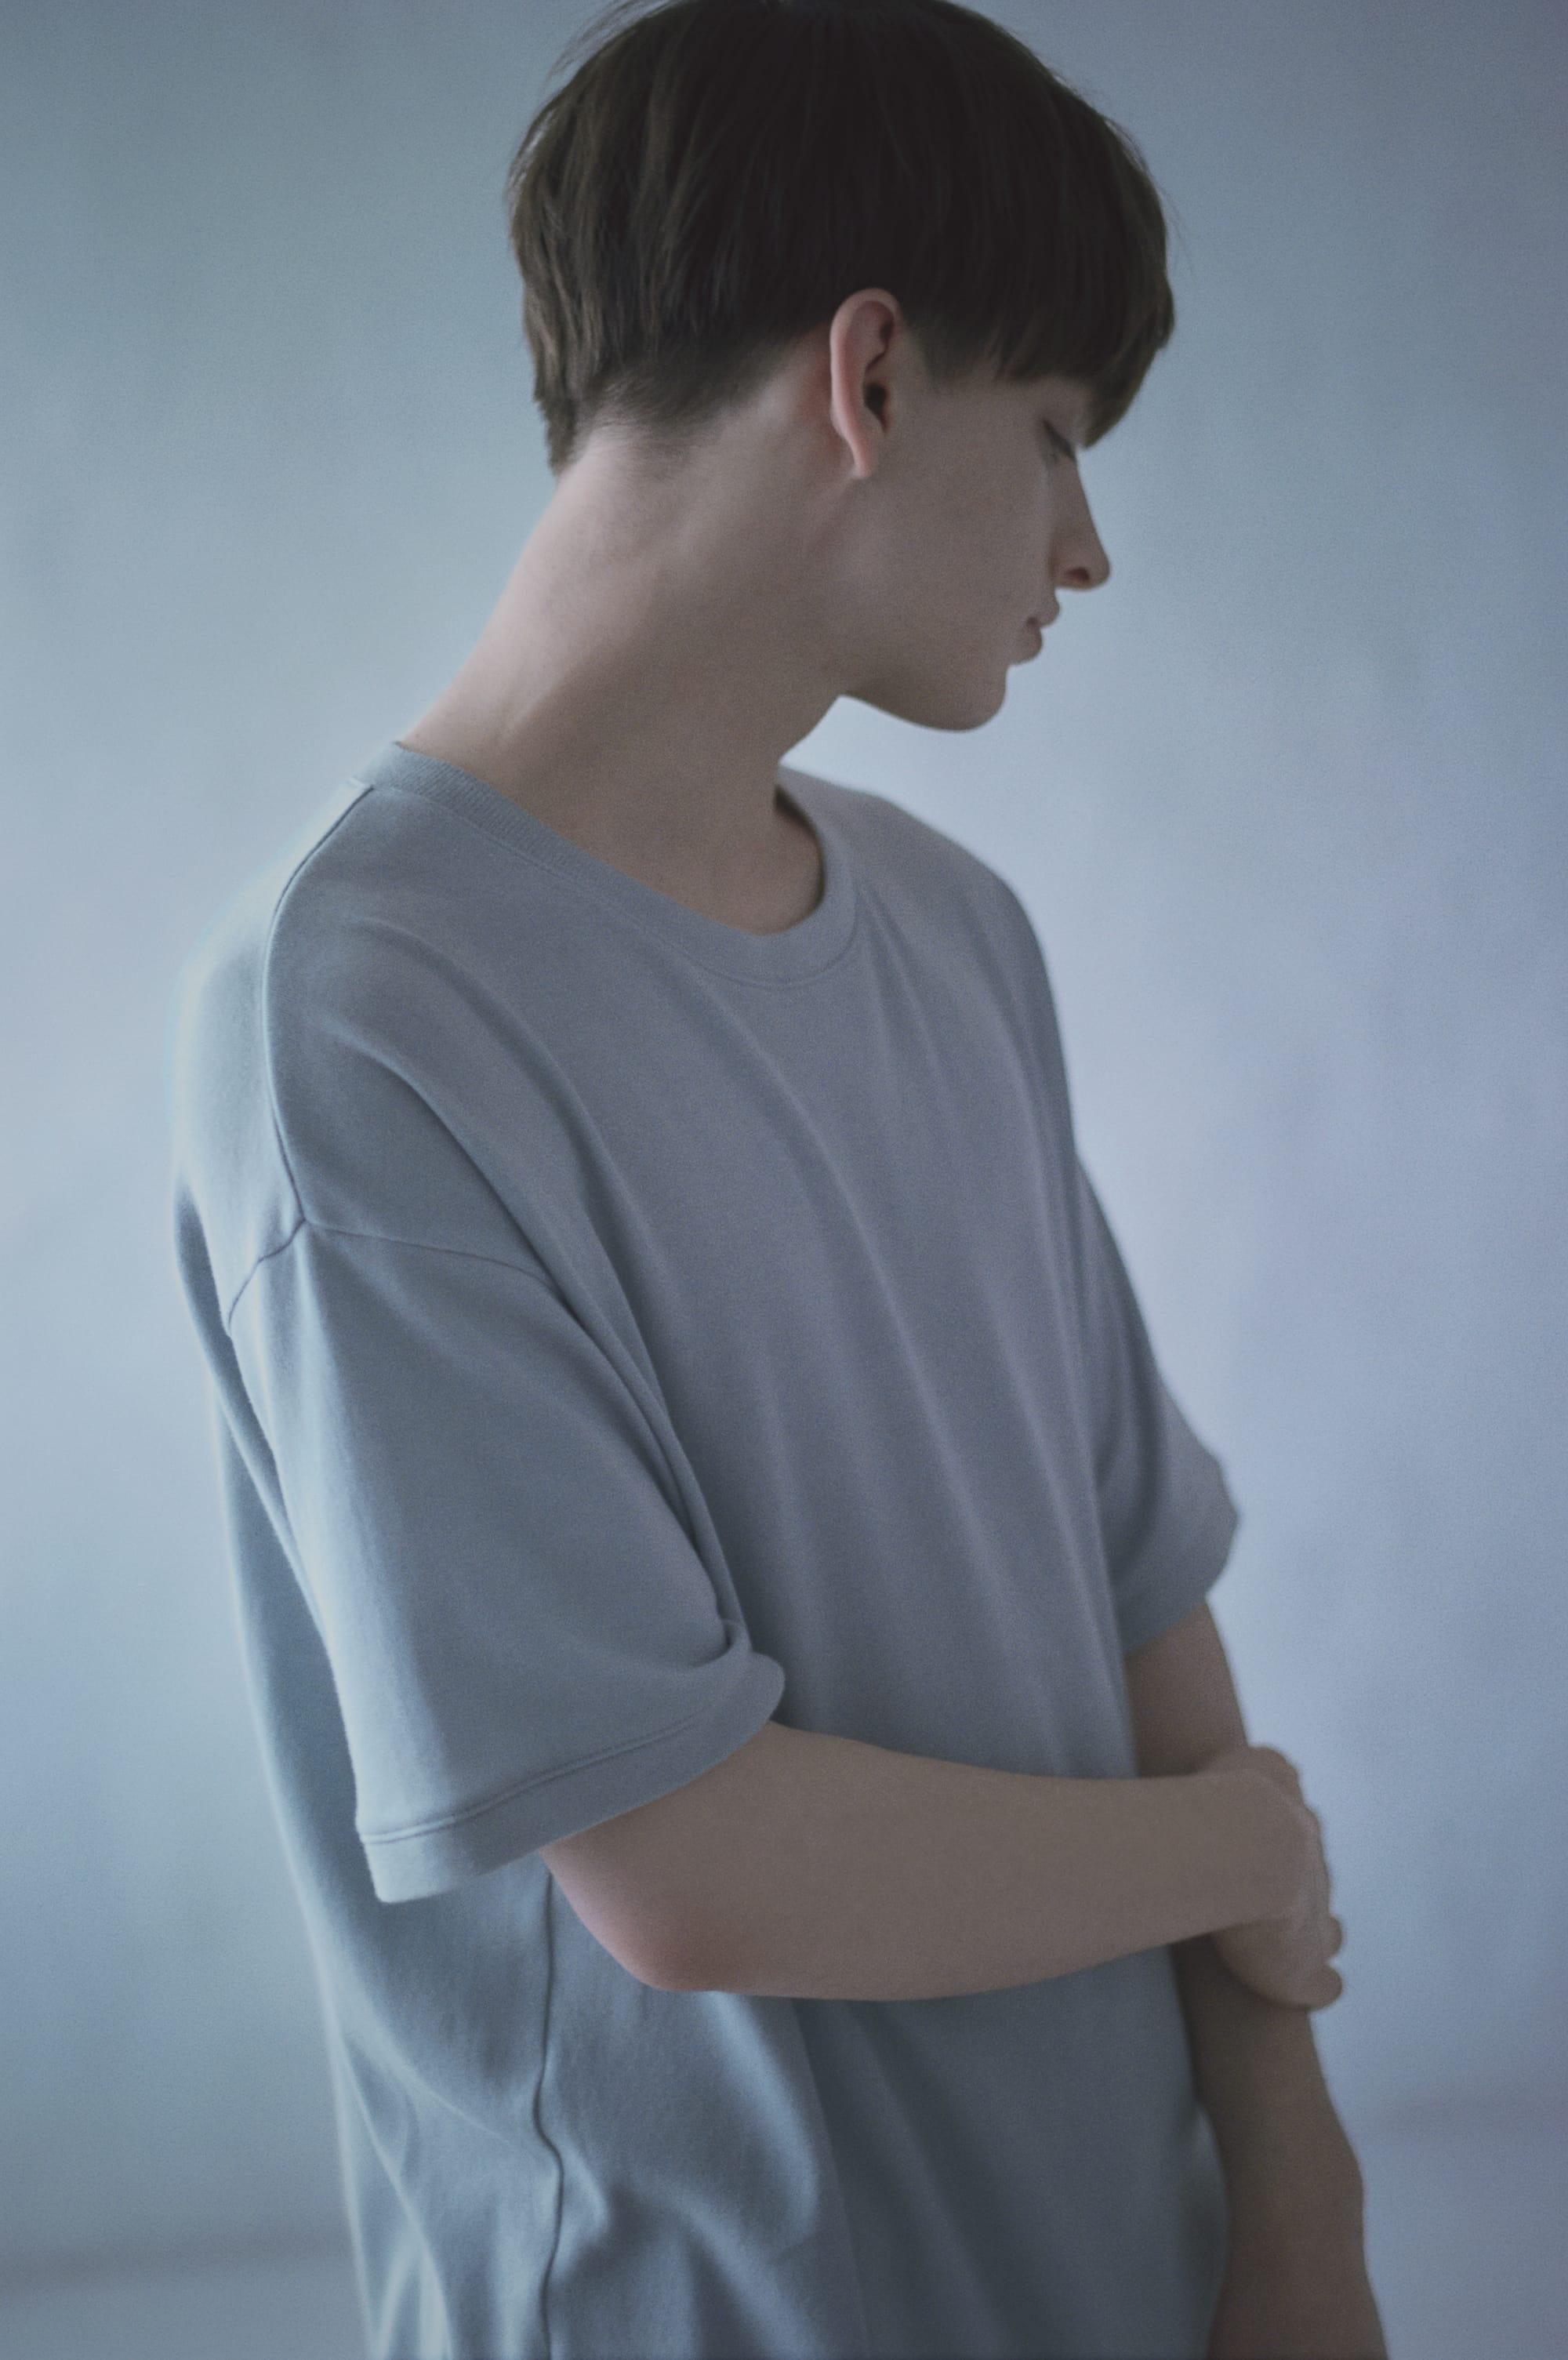 「FURERU」コレクションでは柔らかな着心地のメンズTシャツをラインナップ。「エアコットン ショートスリーブ Tシャツ」17,800円(税込)。